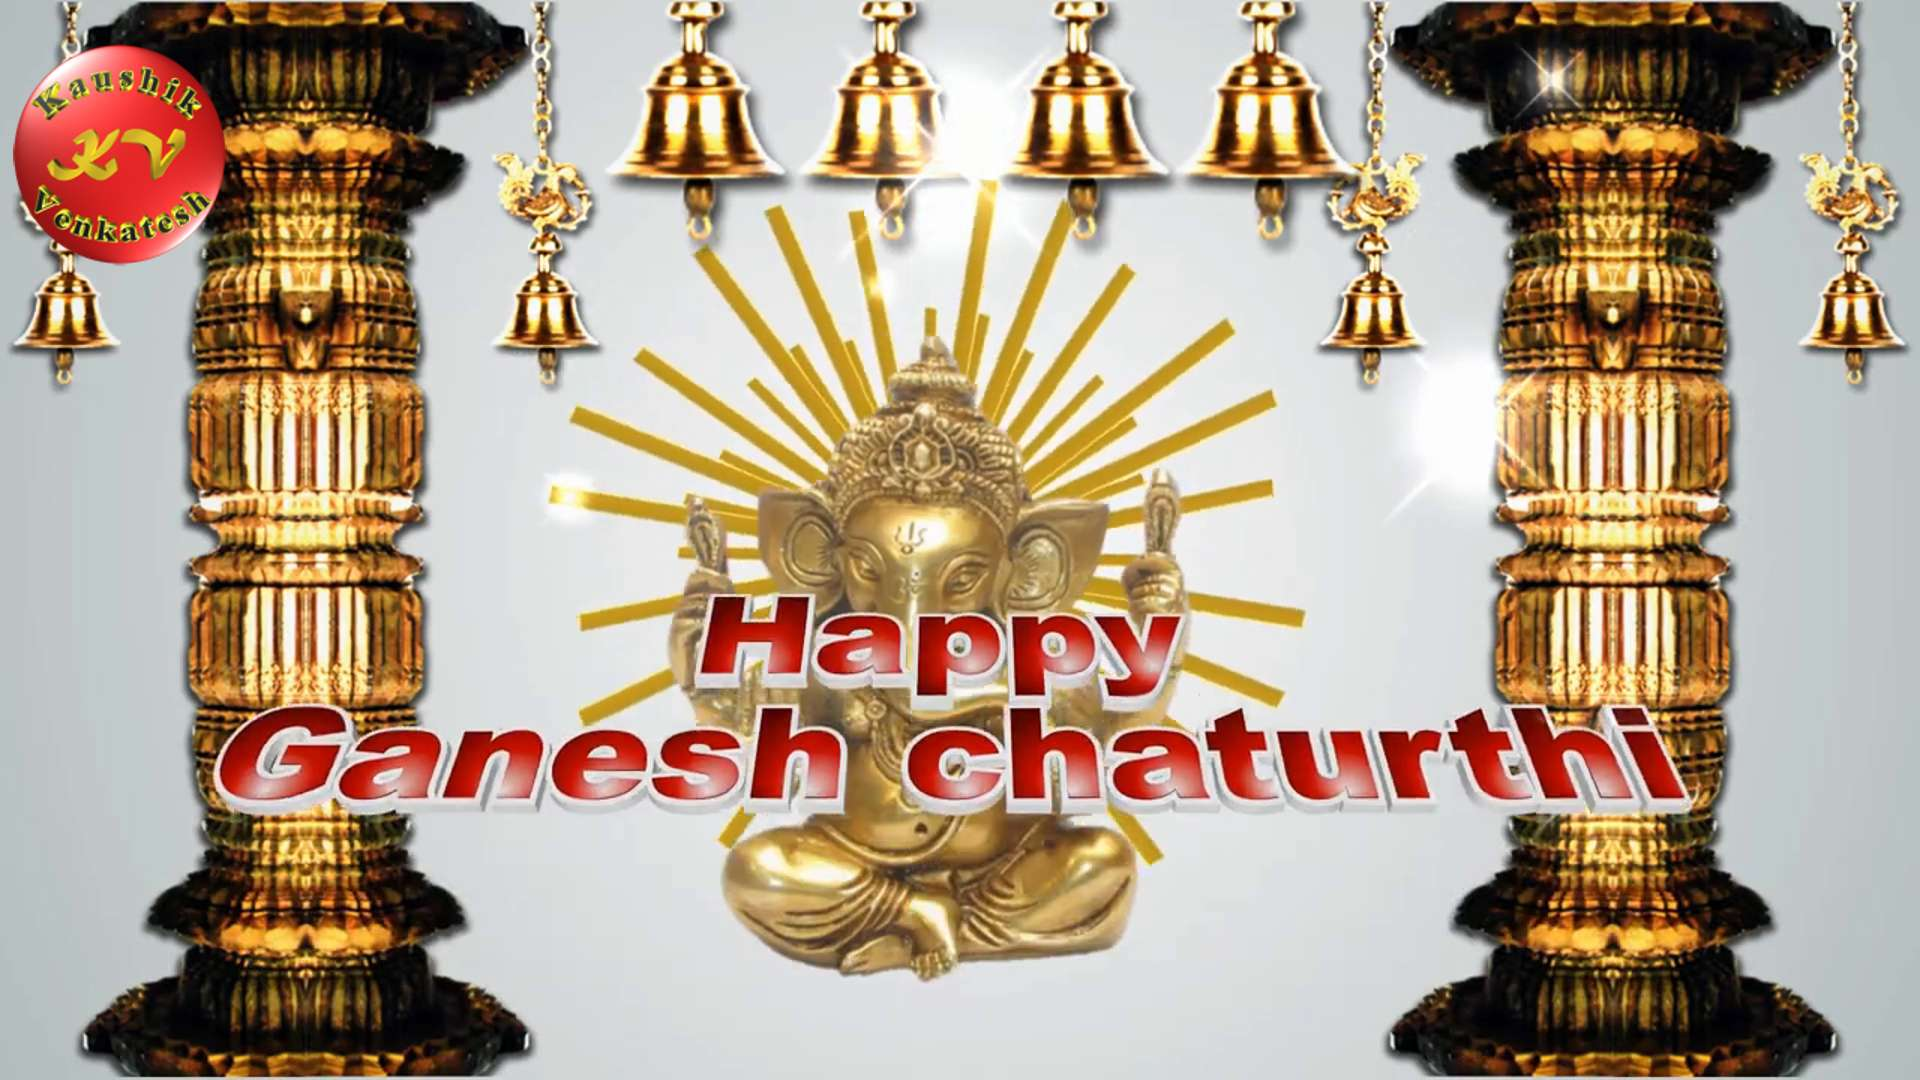 Greetings Image of Ganesh Chaturthi Wishes Video